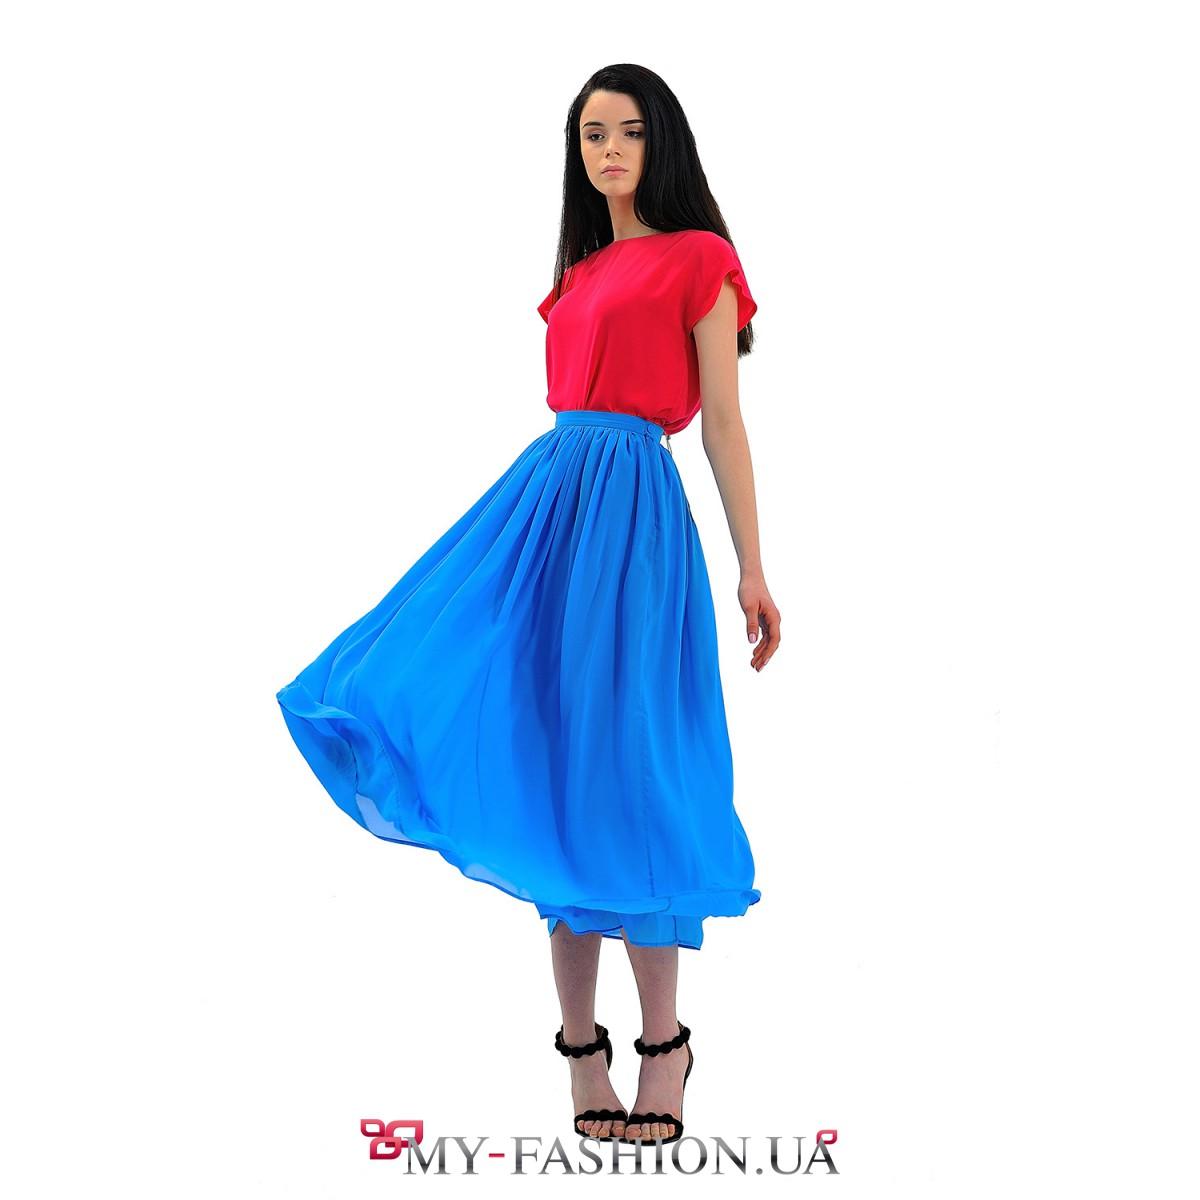 Модели блузок с коротким рукавом доставка